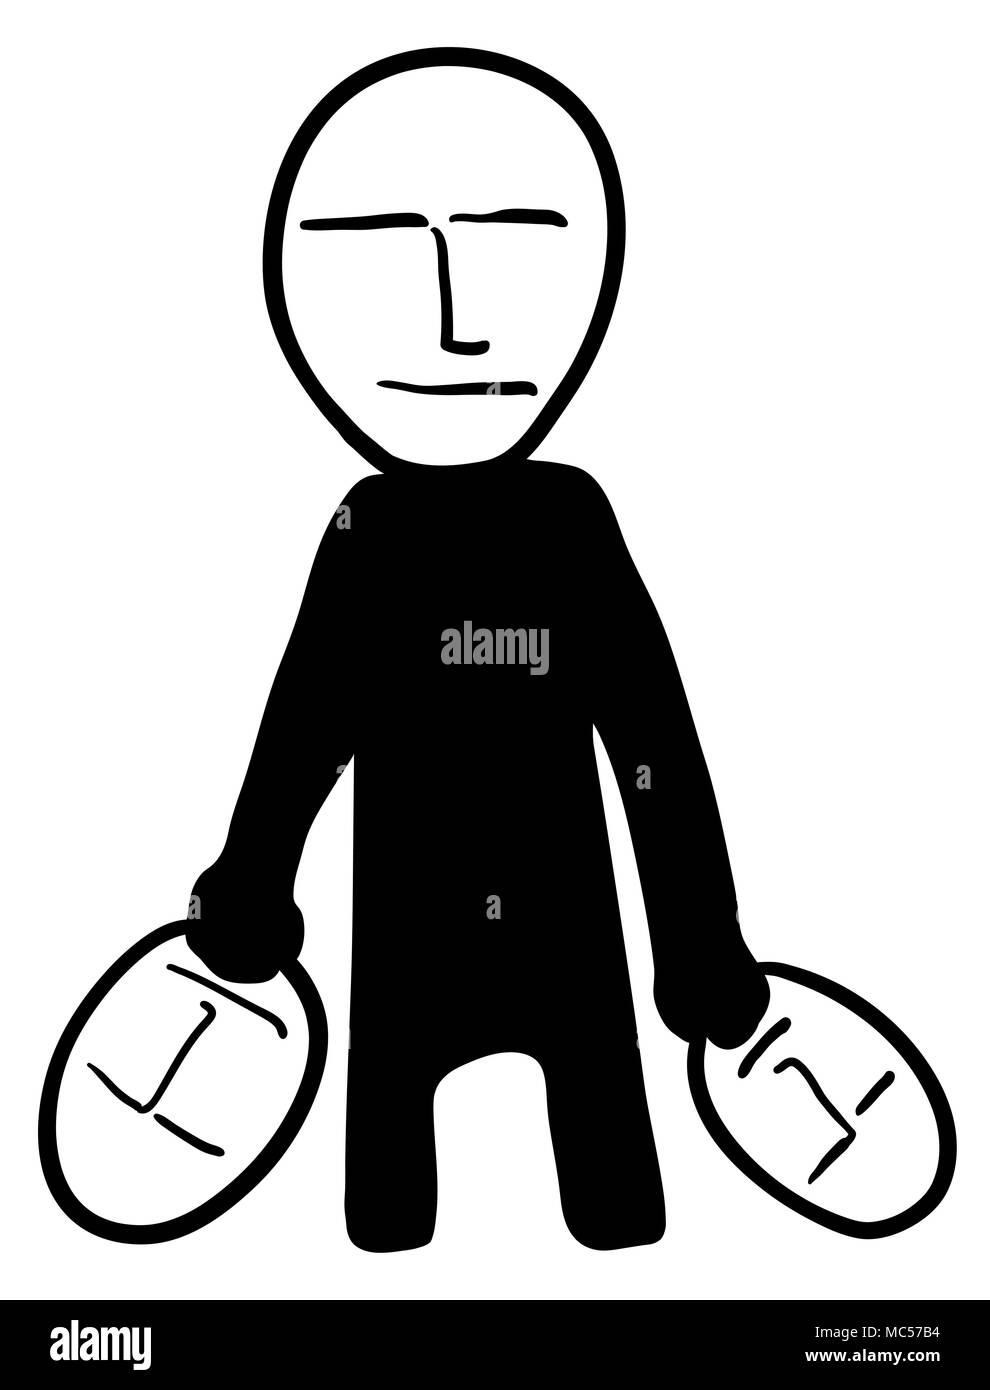 Masks identity figure black, vector illustration, vertical, over white, isolated - Stock Image